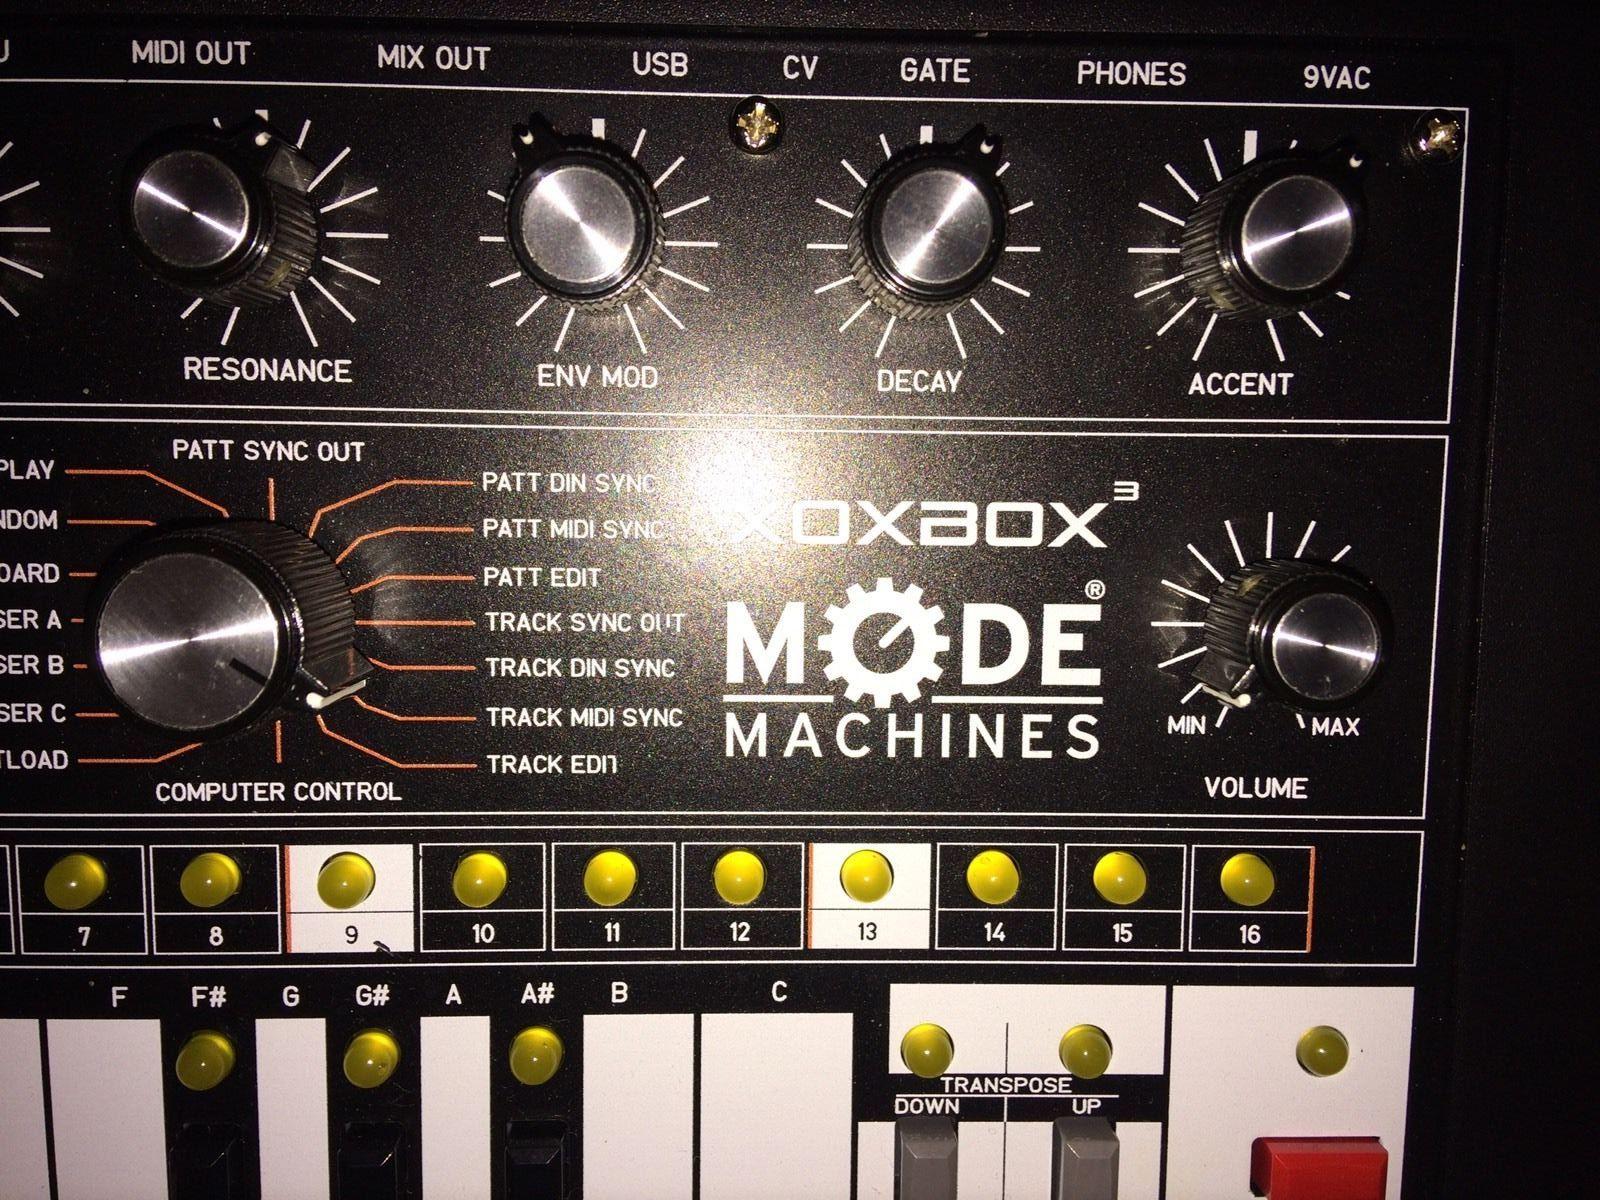 MATRIXSYNTH: Mode Machines Xoxbox Mk 3 Synth + Sequencer TB-303 Clone